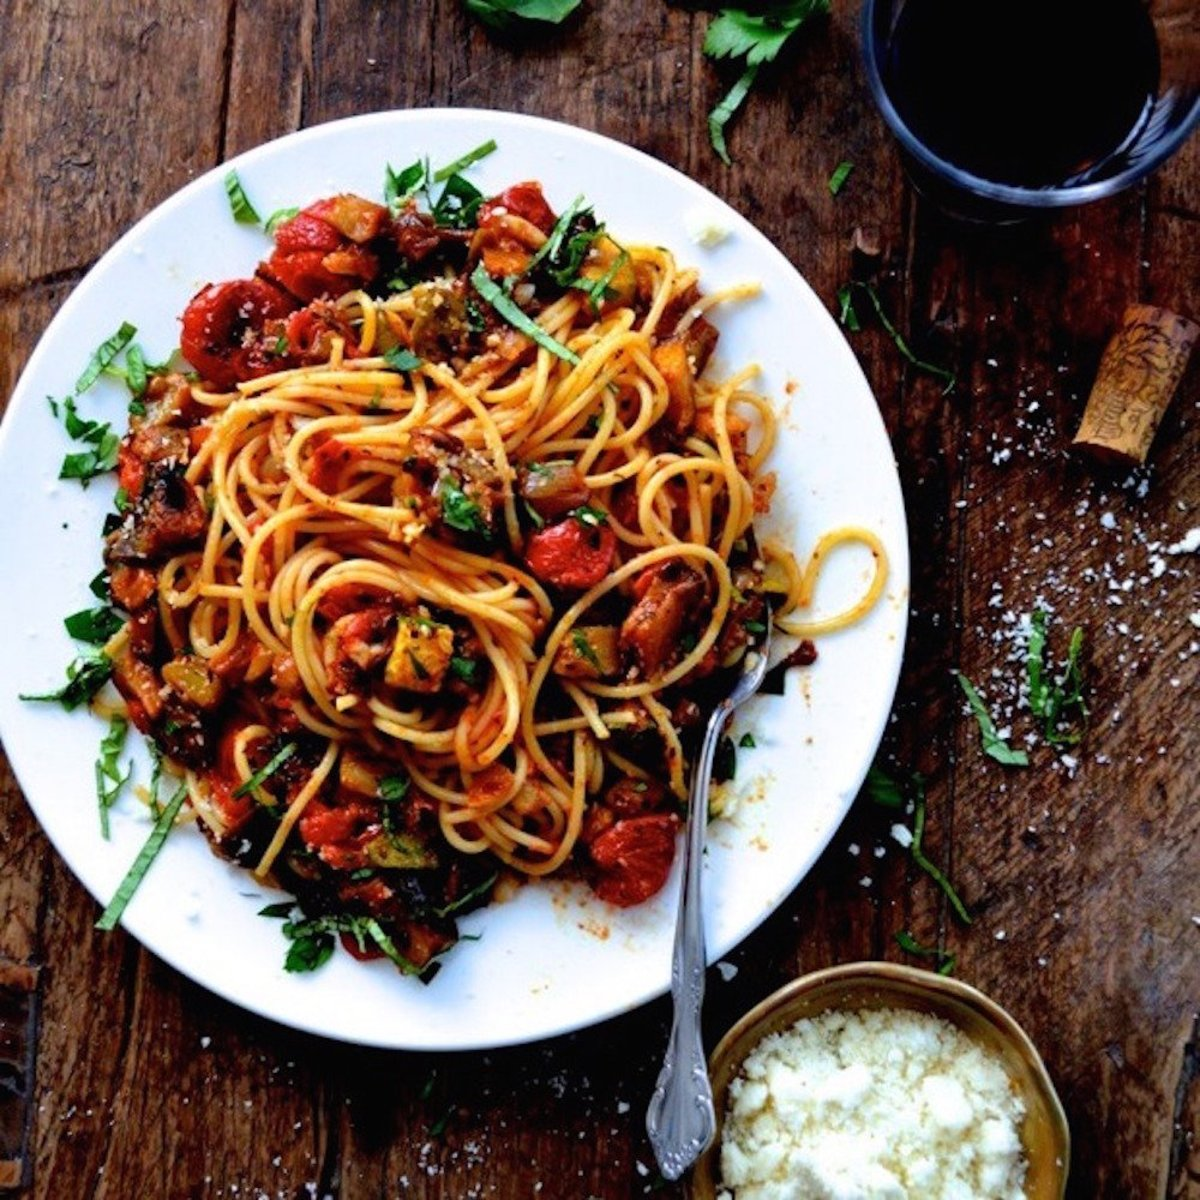 tomato recipes - ratatouille pasta